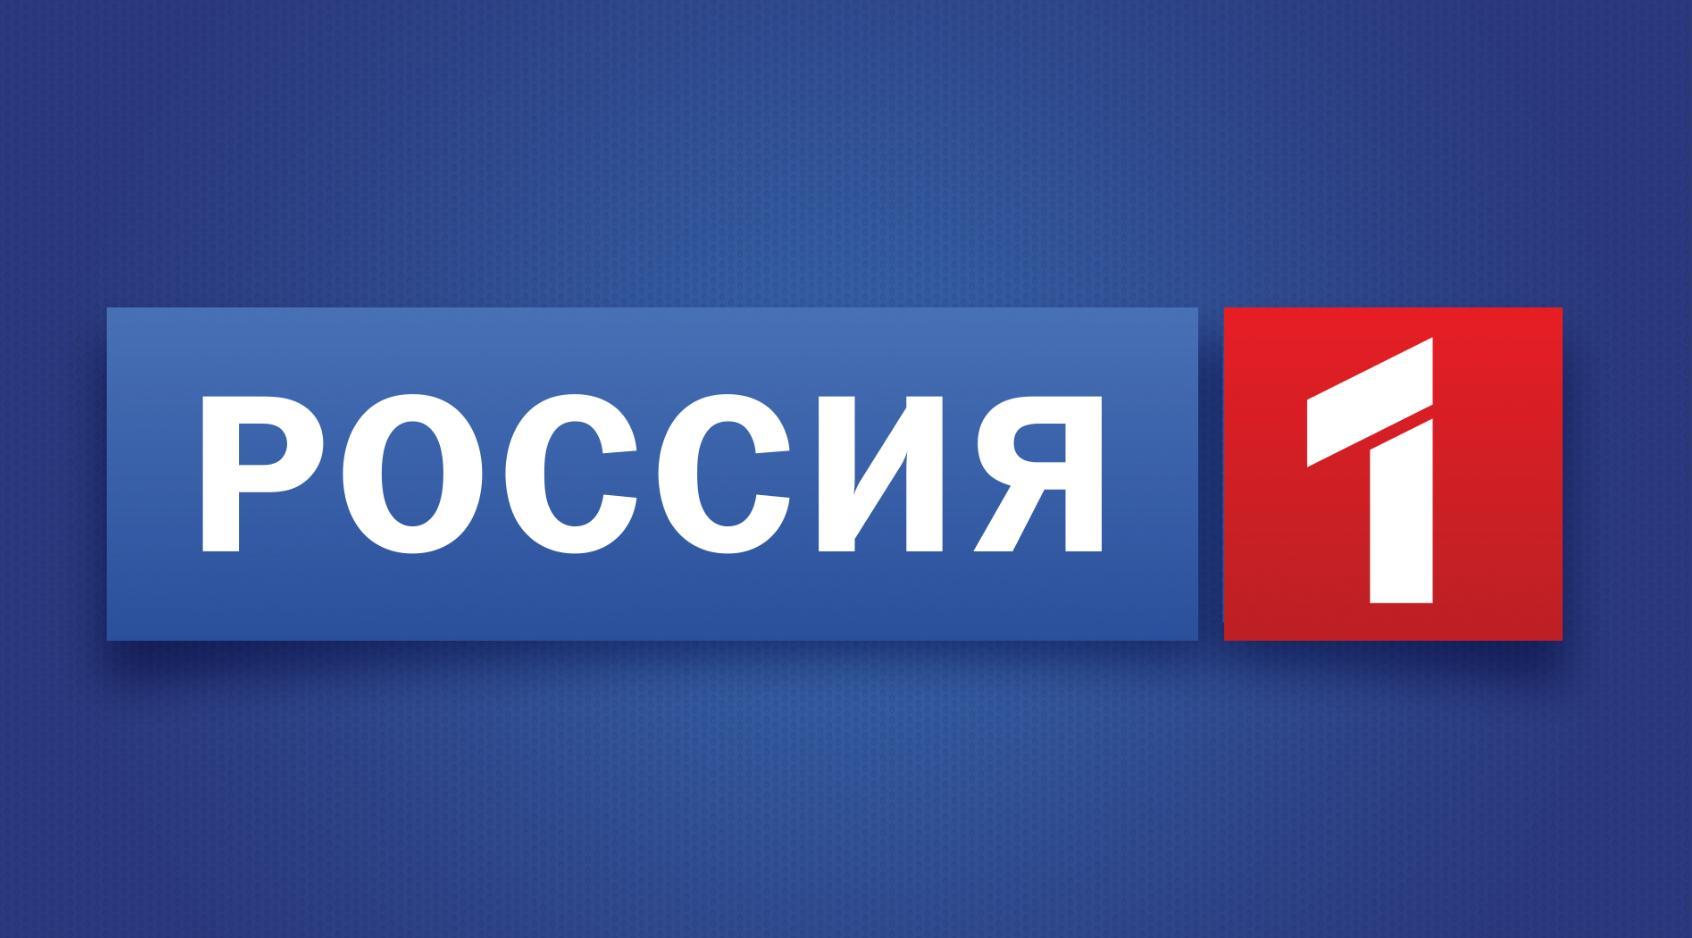 Тв программа на россии 1 на сегодня